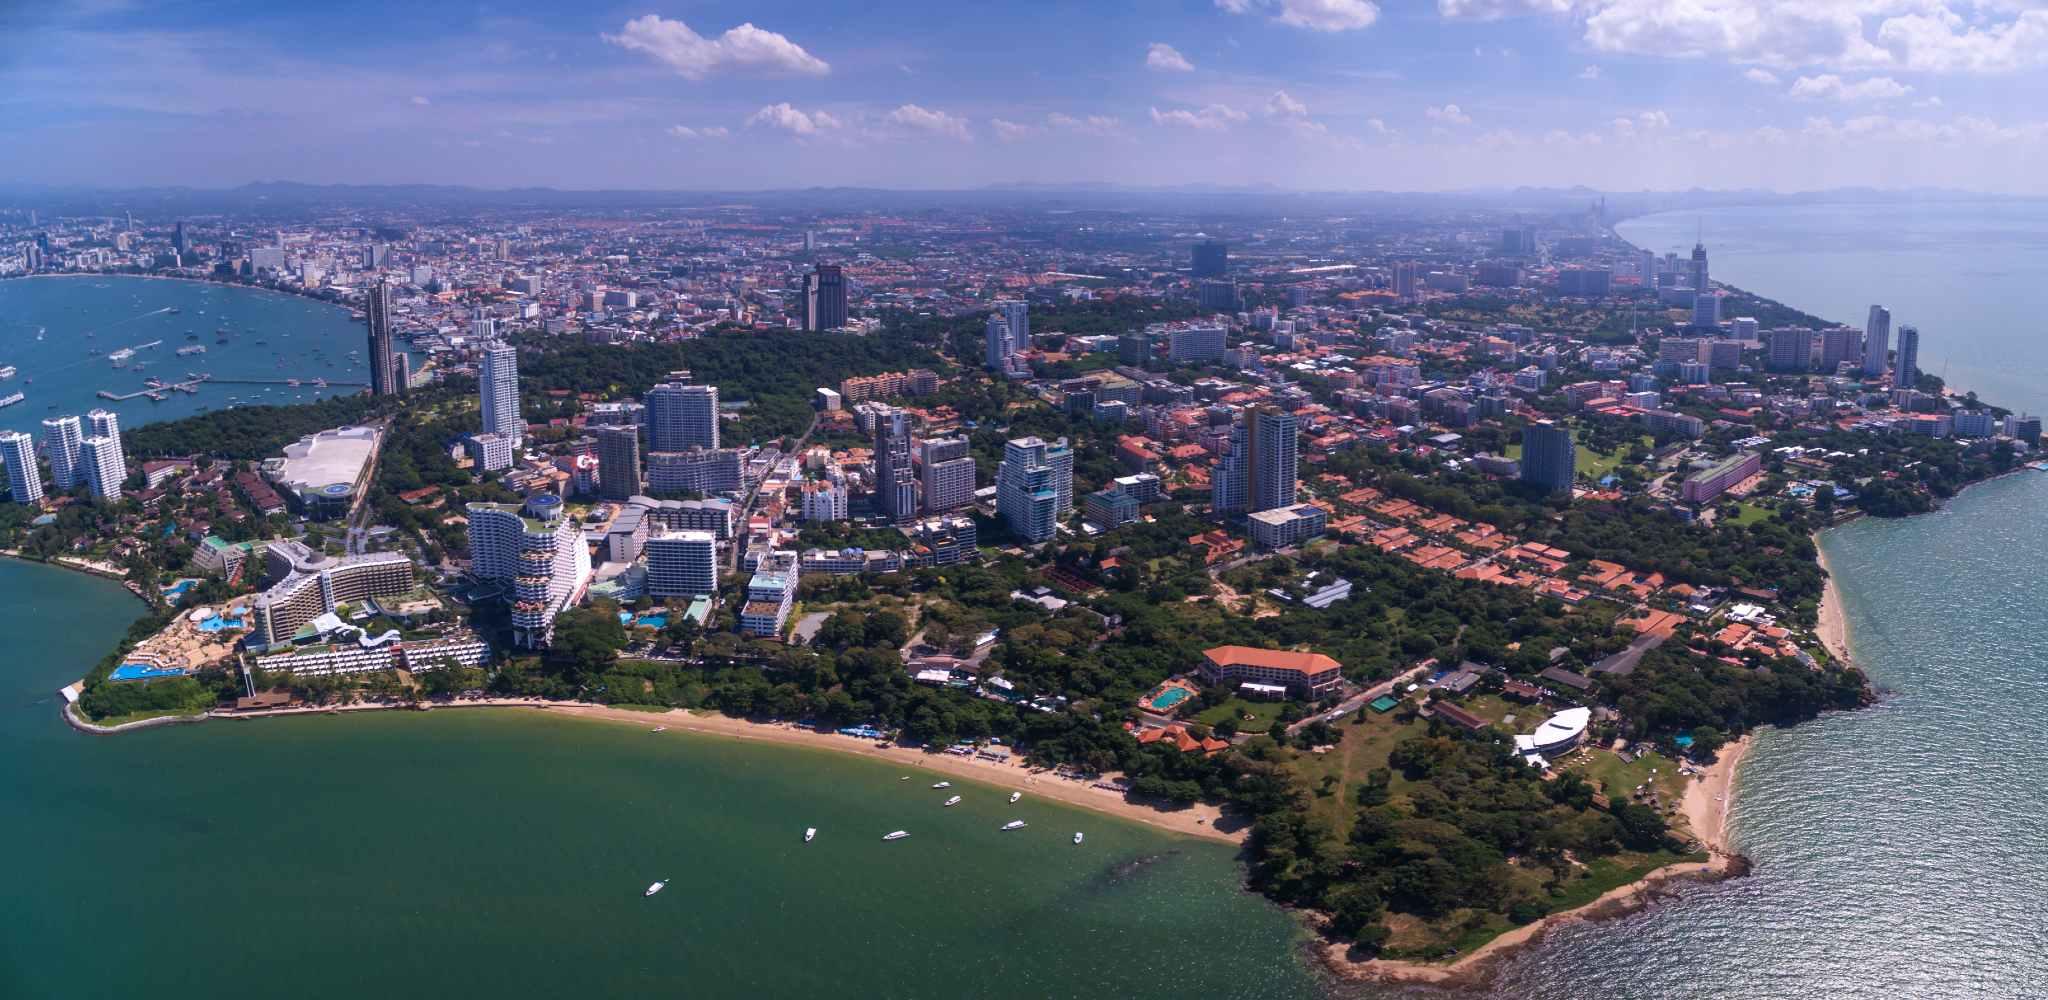 Pattaya Beach seen from the air